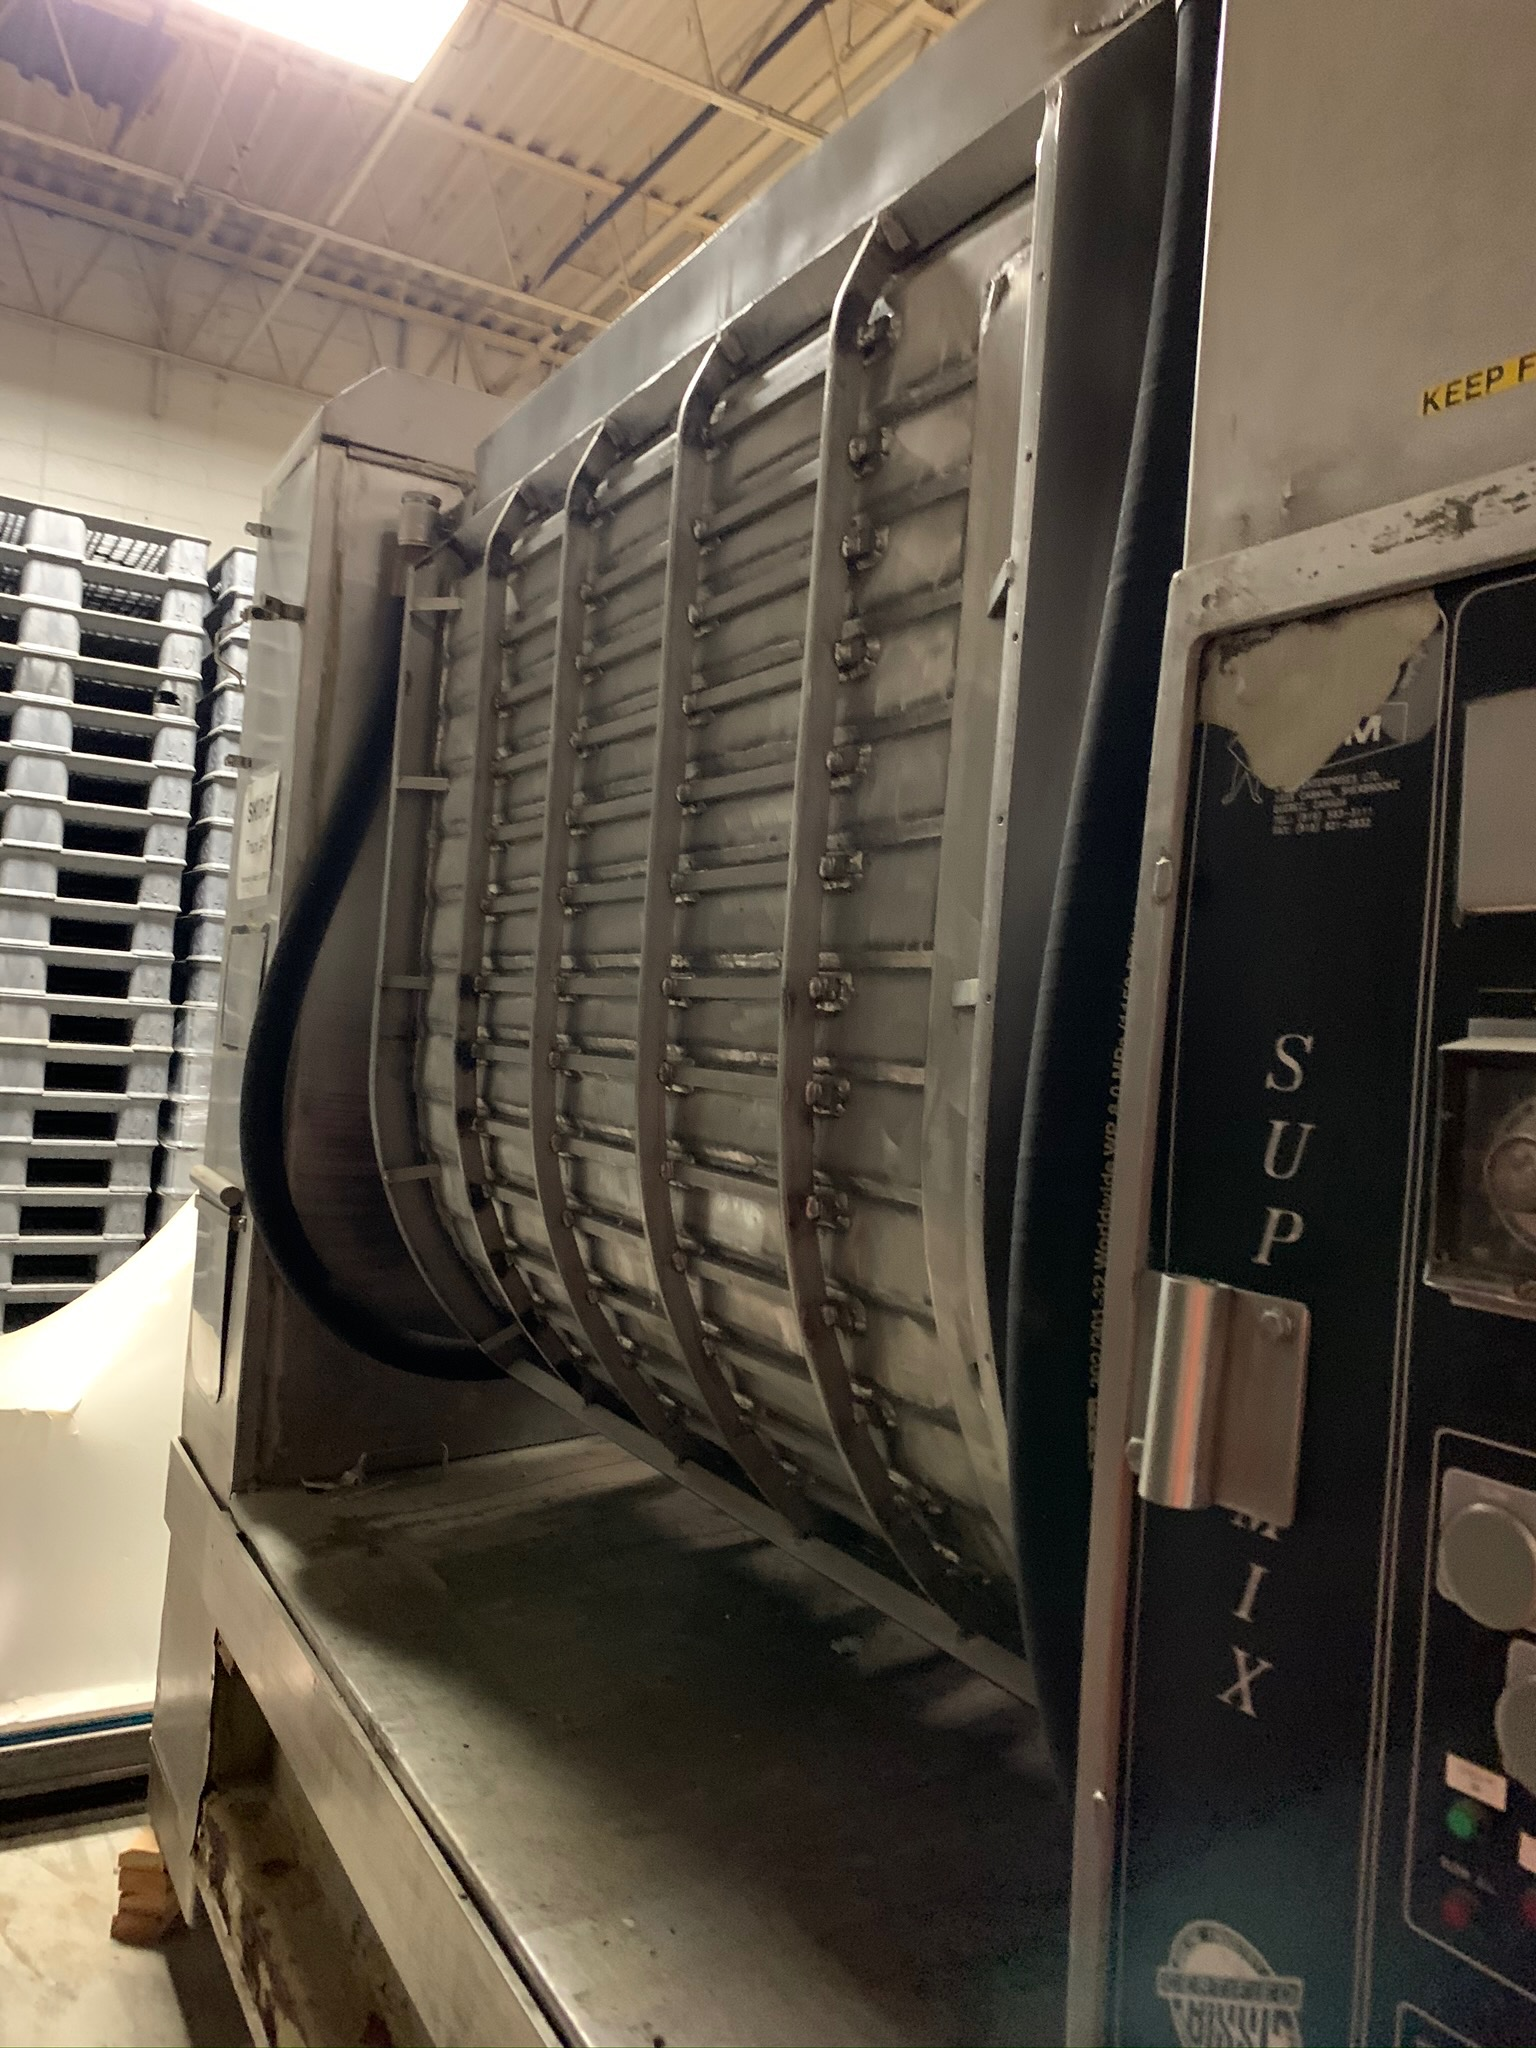 ETMW Roller Bar Mixer Model ETM-HI-TE 2000 Lb Capacity (Rigging Fee - $1600) - Image 2 of 6